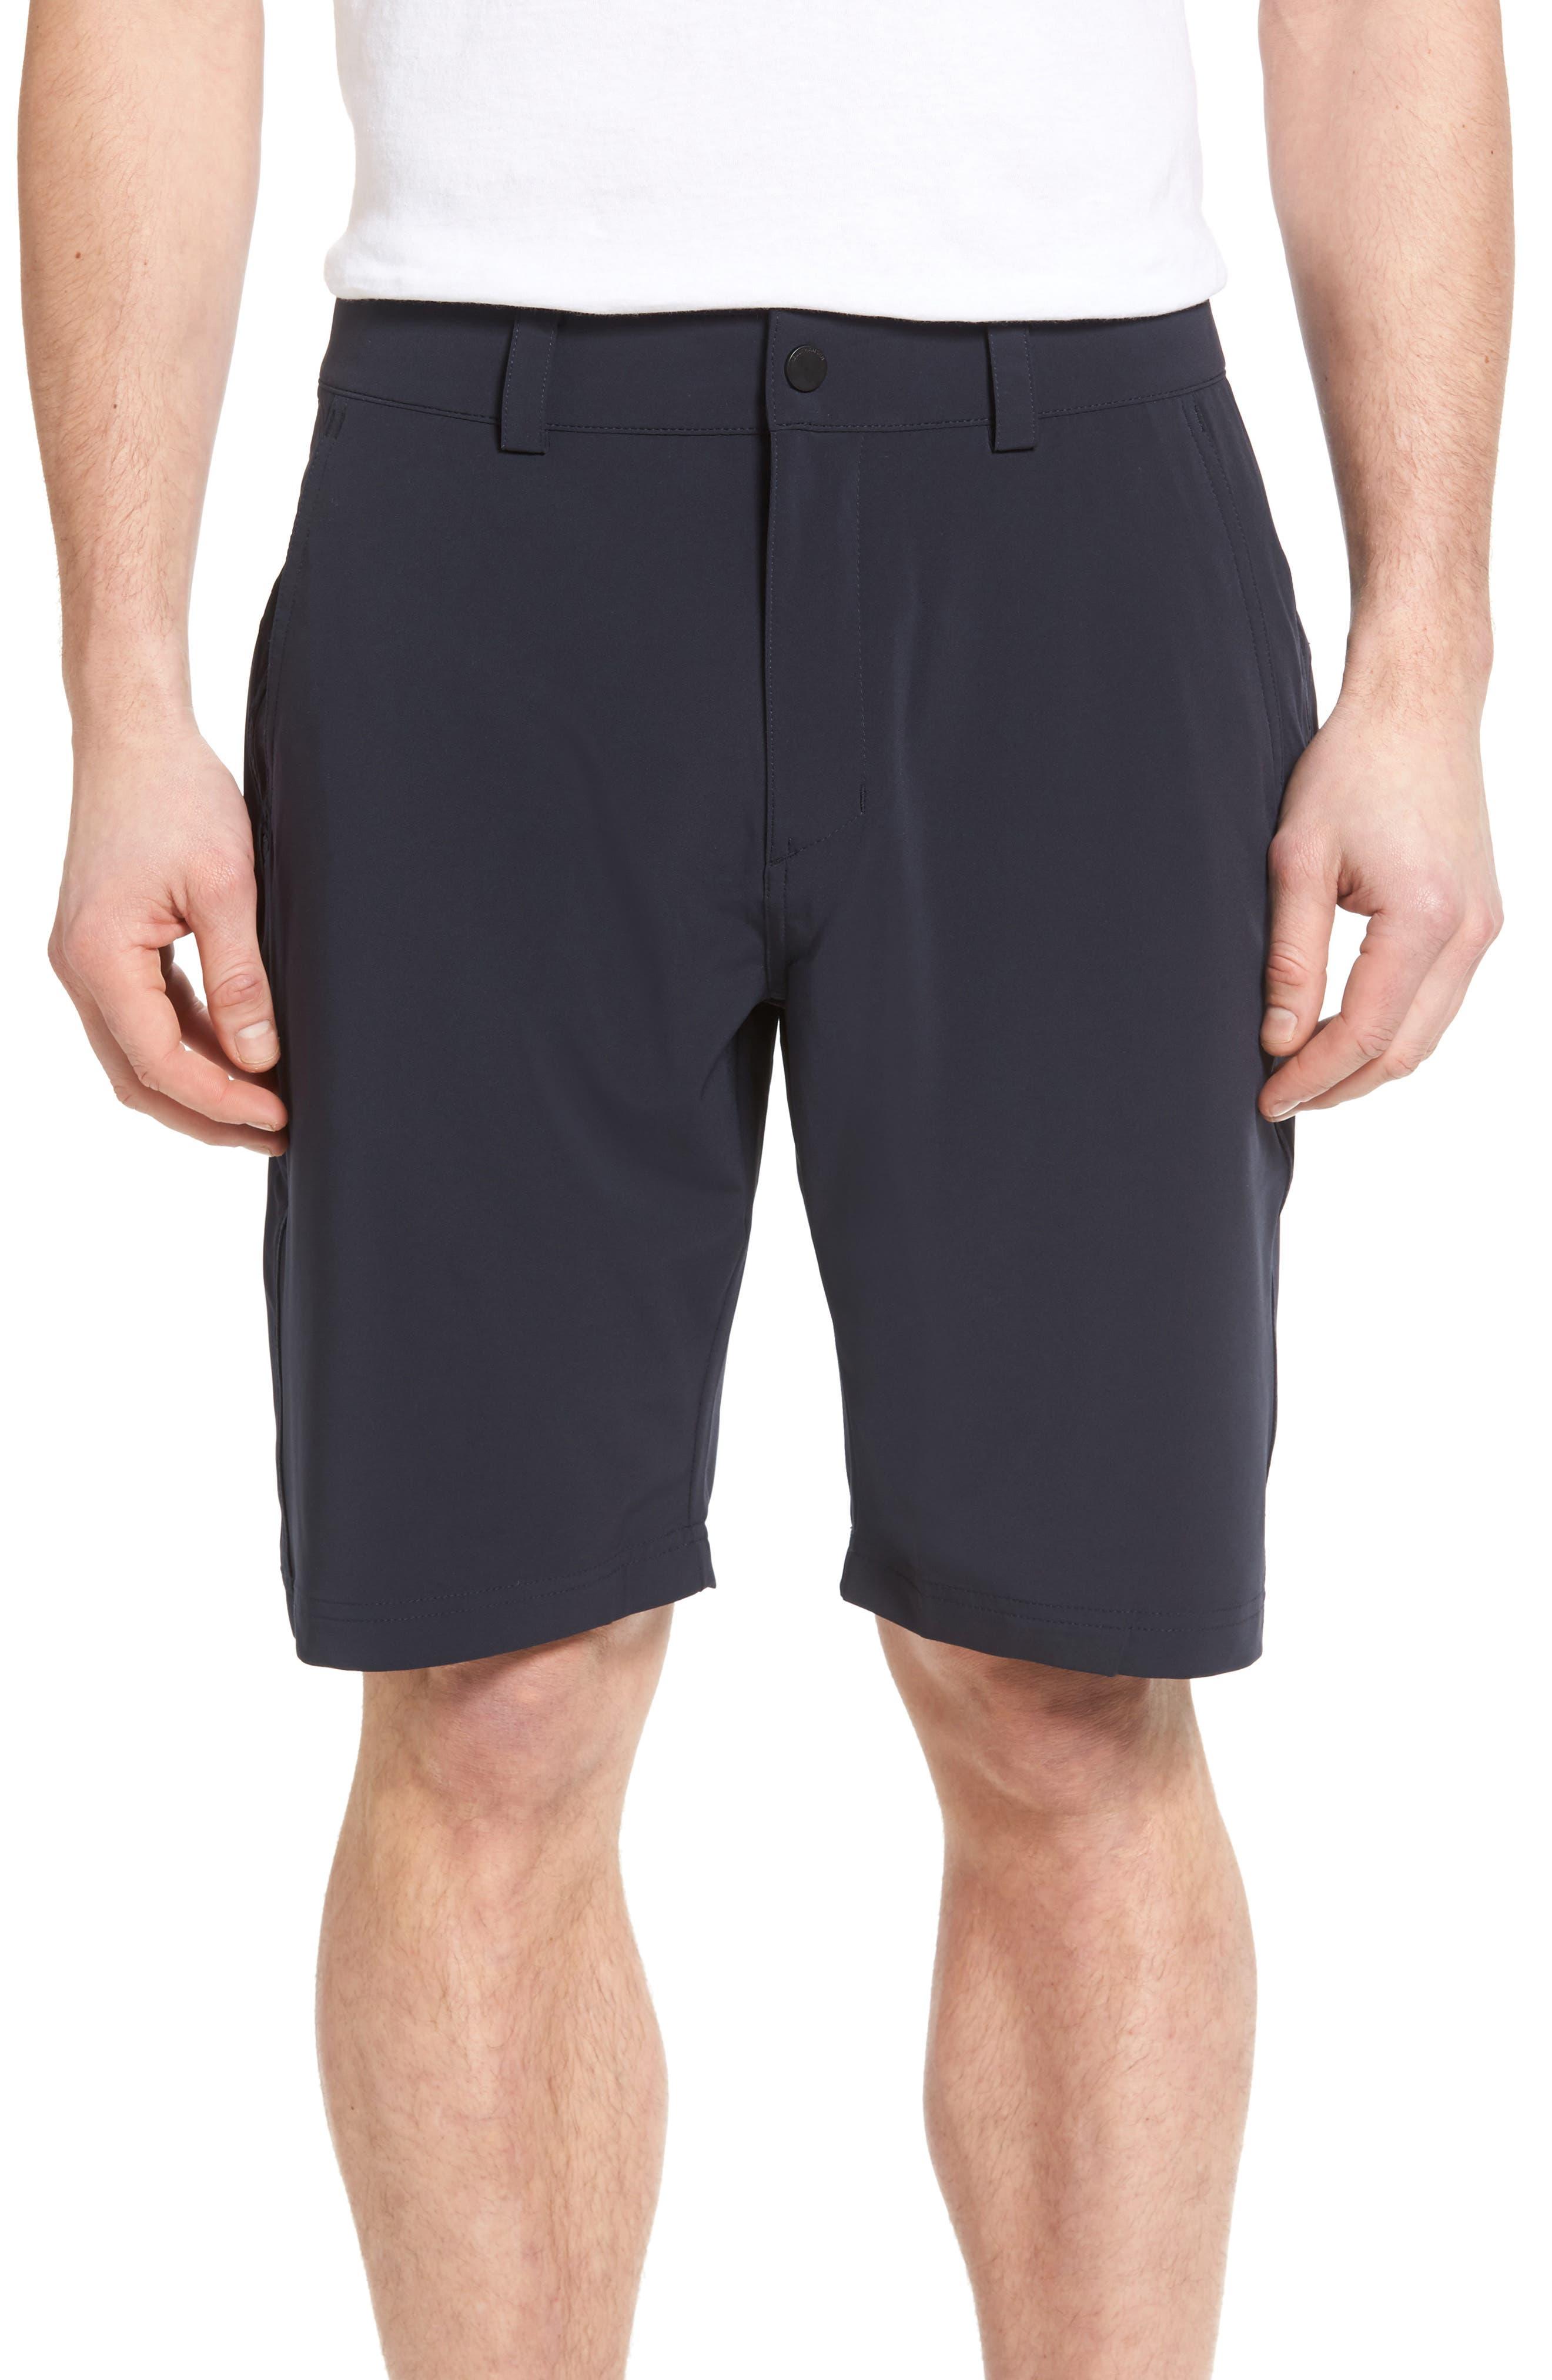 'HP QD Classic' Quick Dry Shorts,                         Main,                         color, Navy